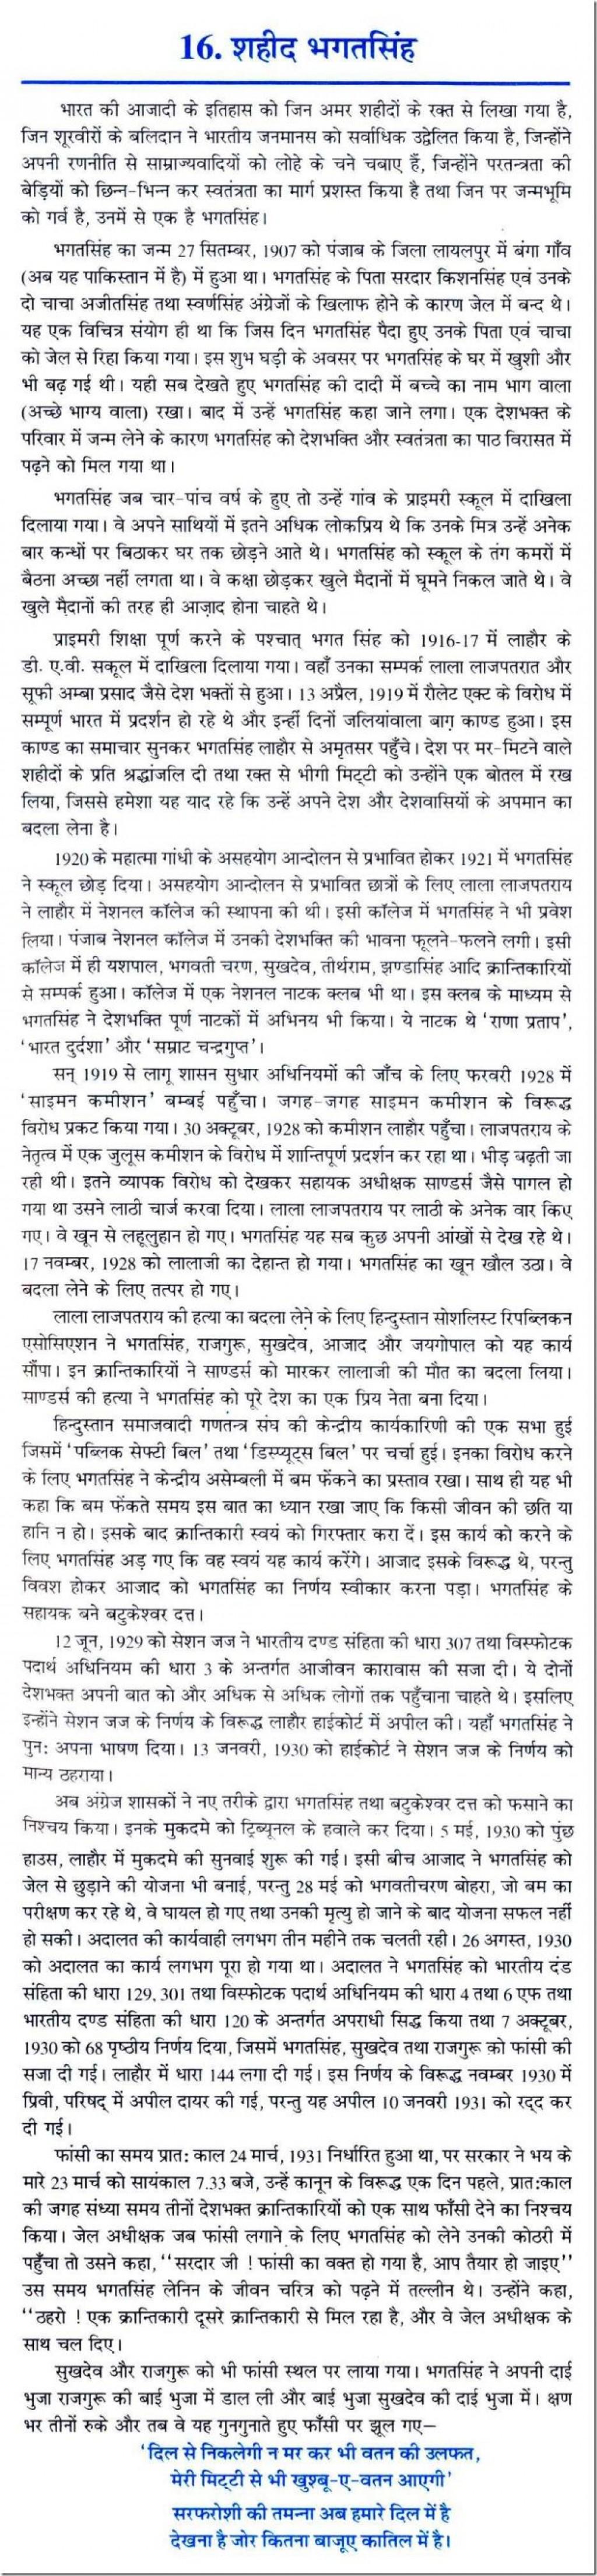 021 Hindi Essay Bhagat Singh Thumb On In Sanskrit English Words Short Punjabi Language Marathi Kannada Telugu Urdu 618x2668 Unique 100 Large